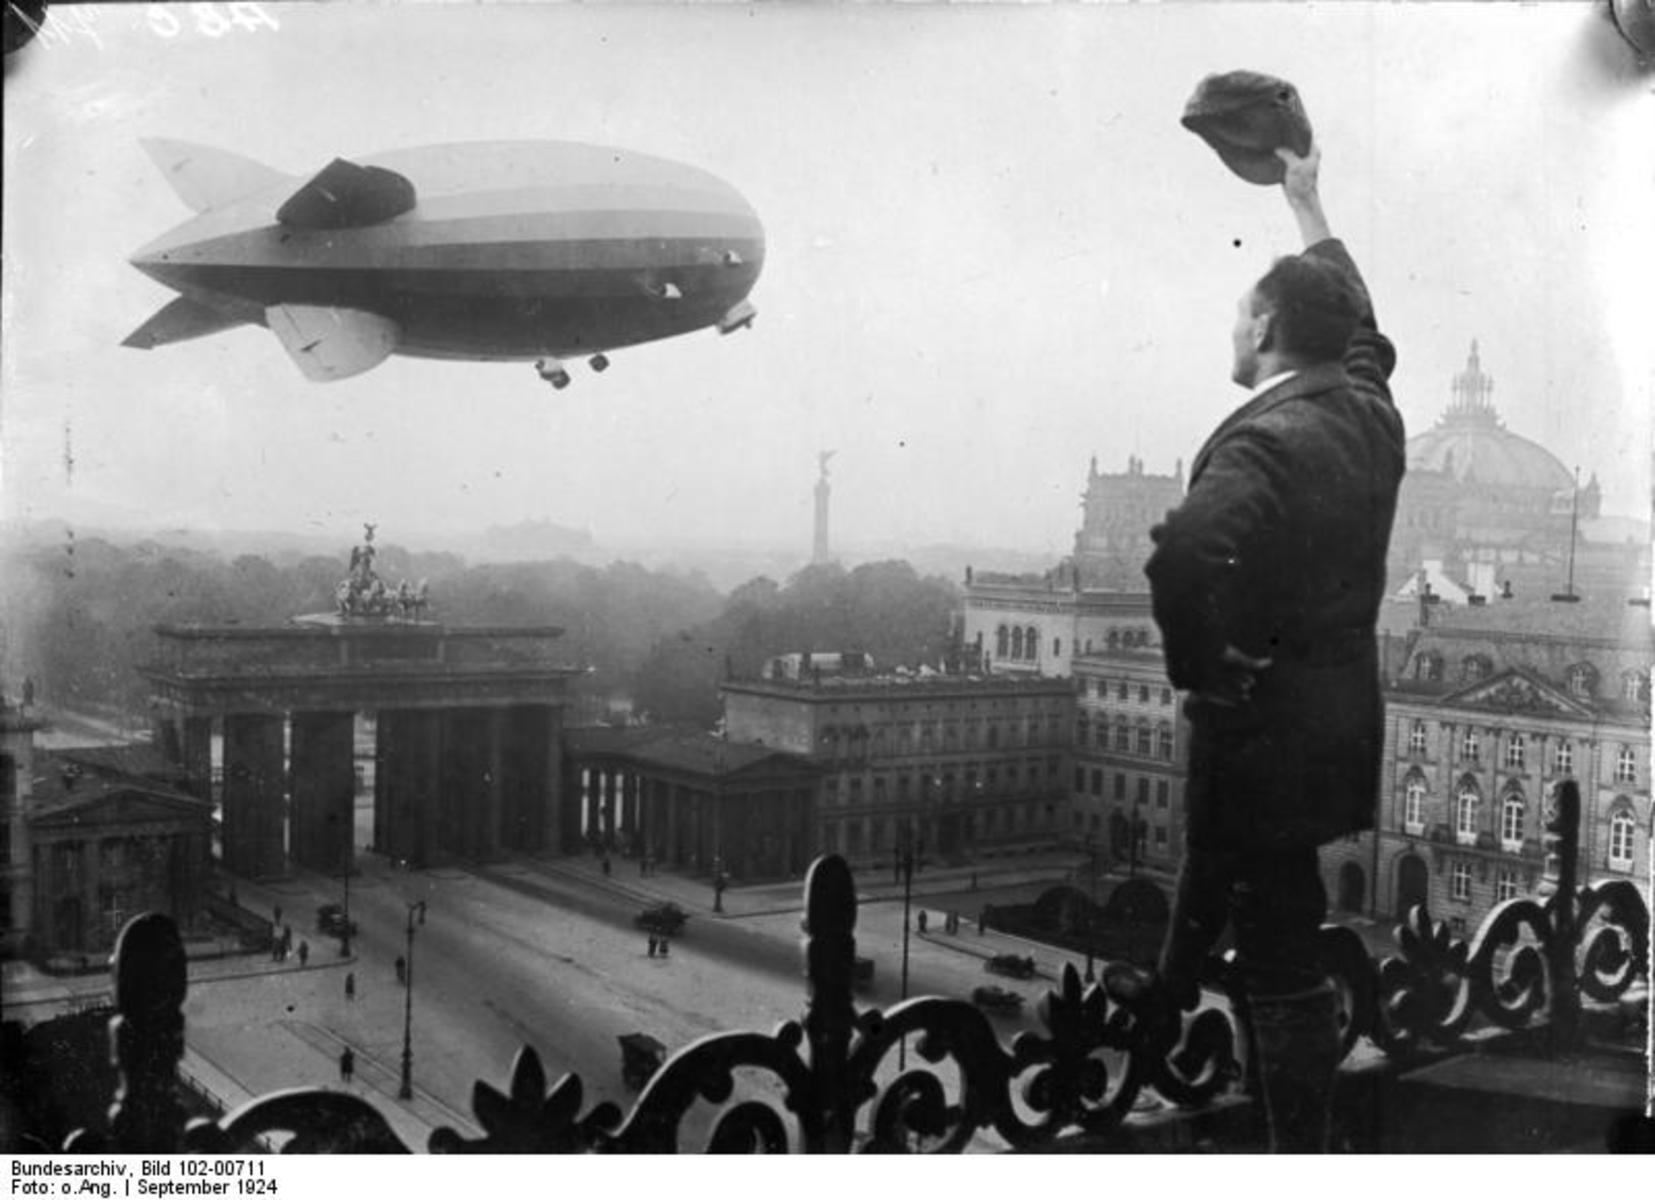 Bundesarchiv_Bild_102-00711,_Berlin,_Zeppelin-Luftschiff_Z.R._III.jpg